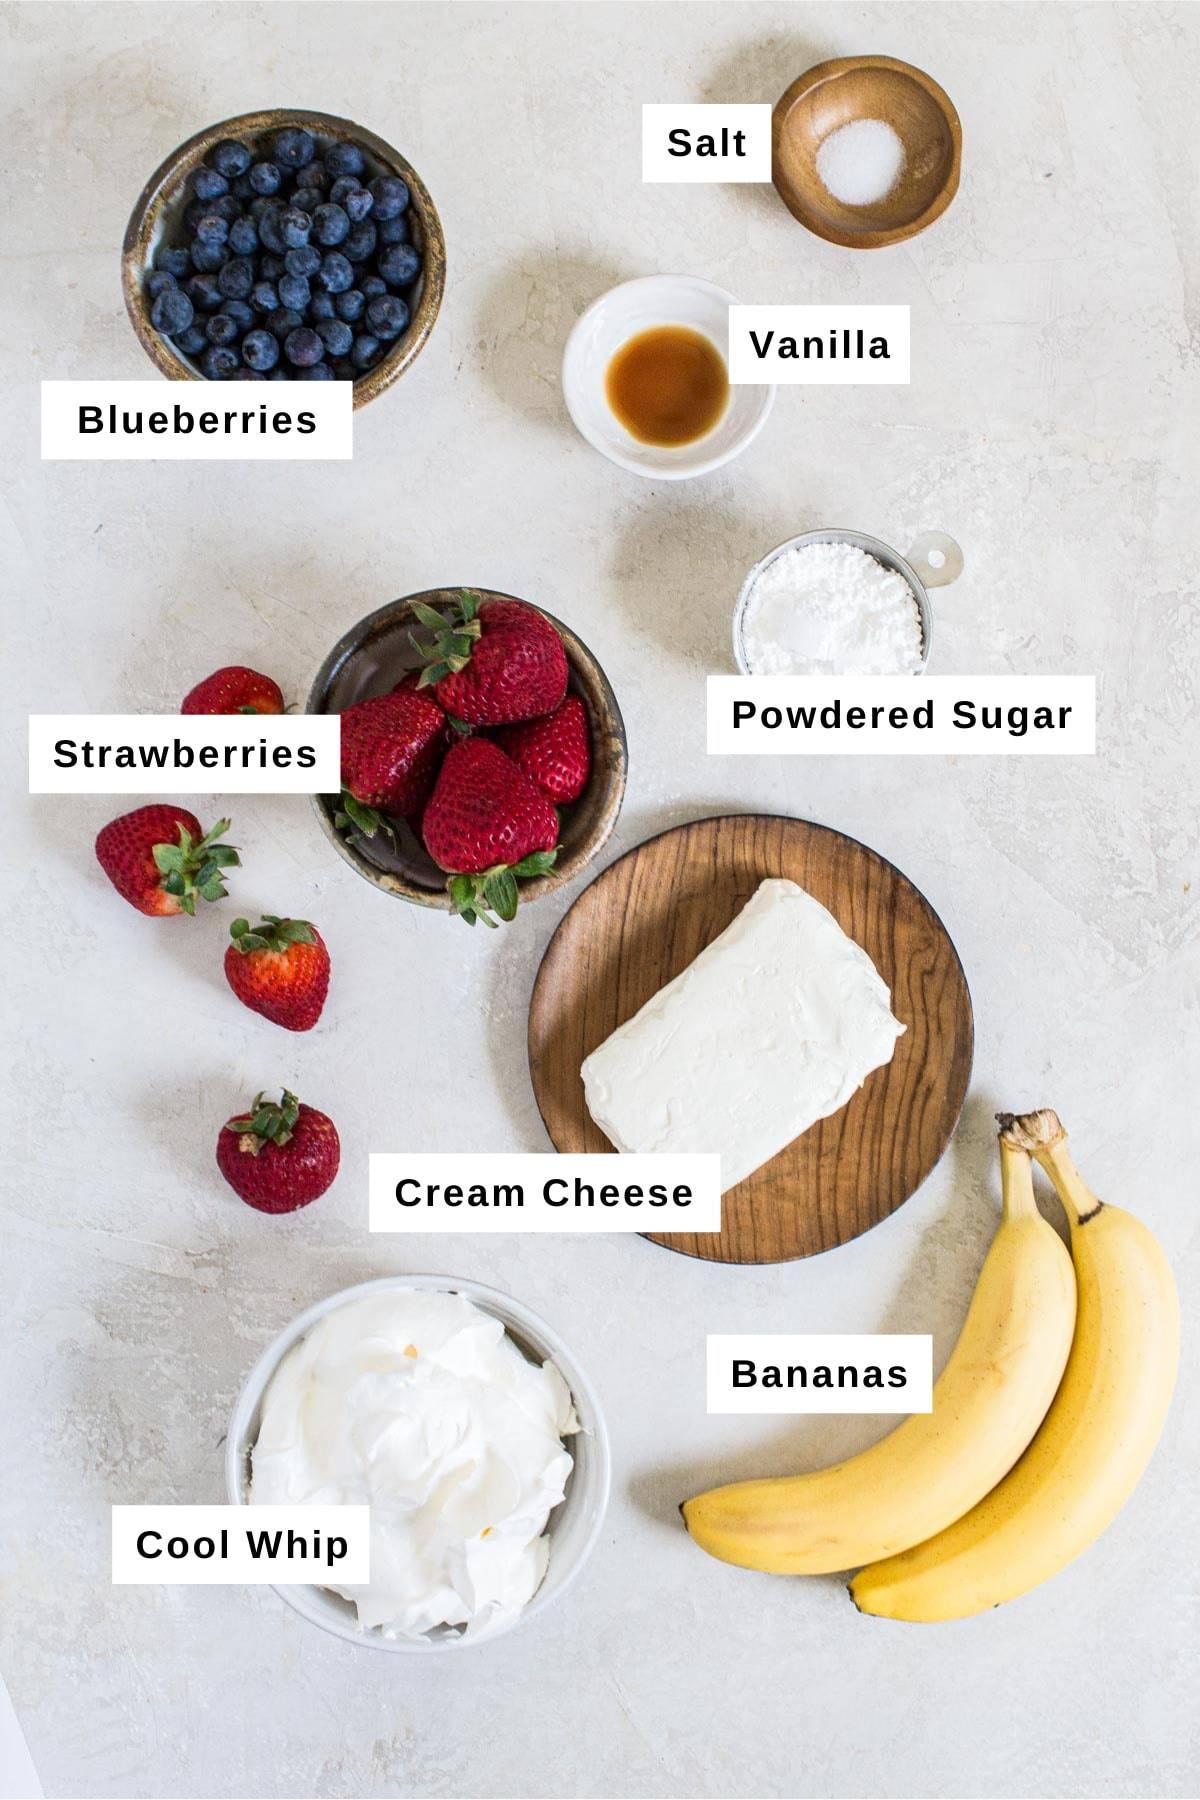 Berry cheesecake salad ingredients.